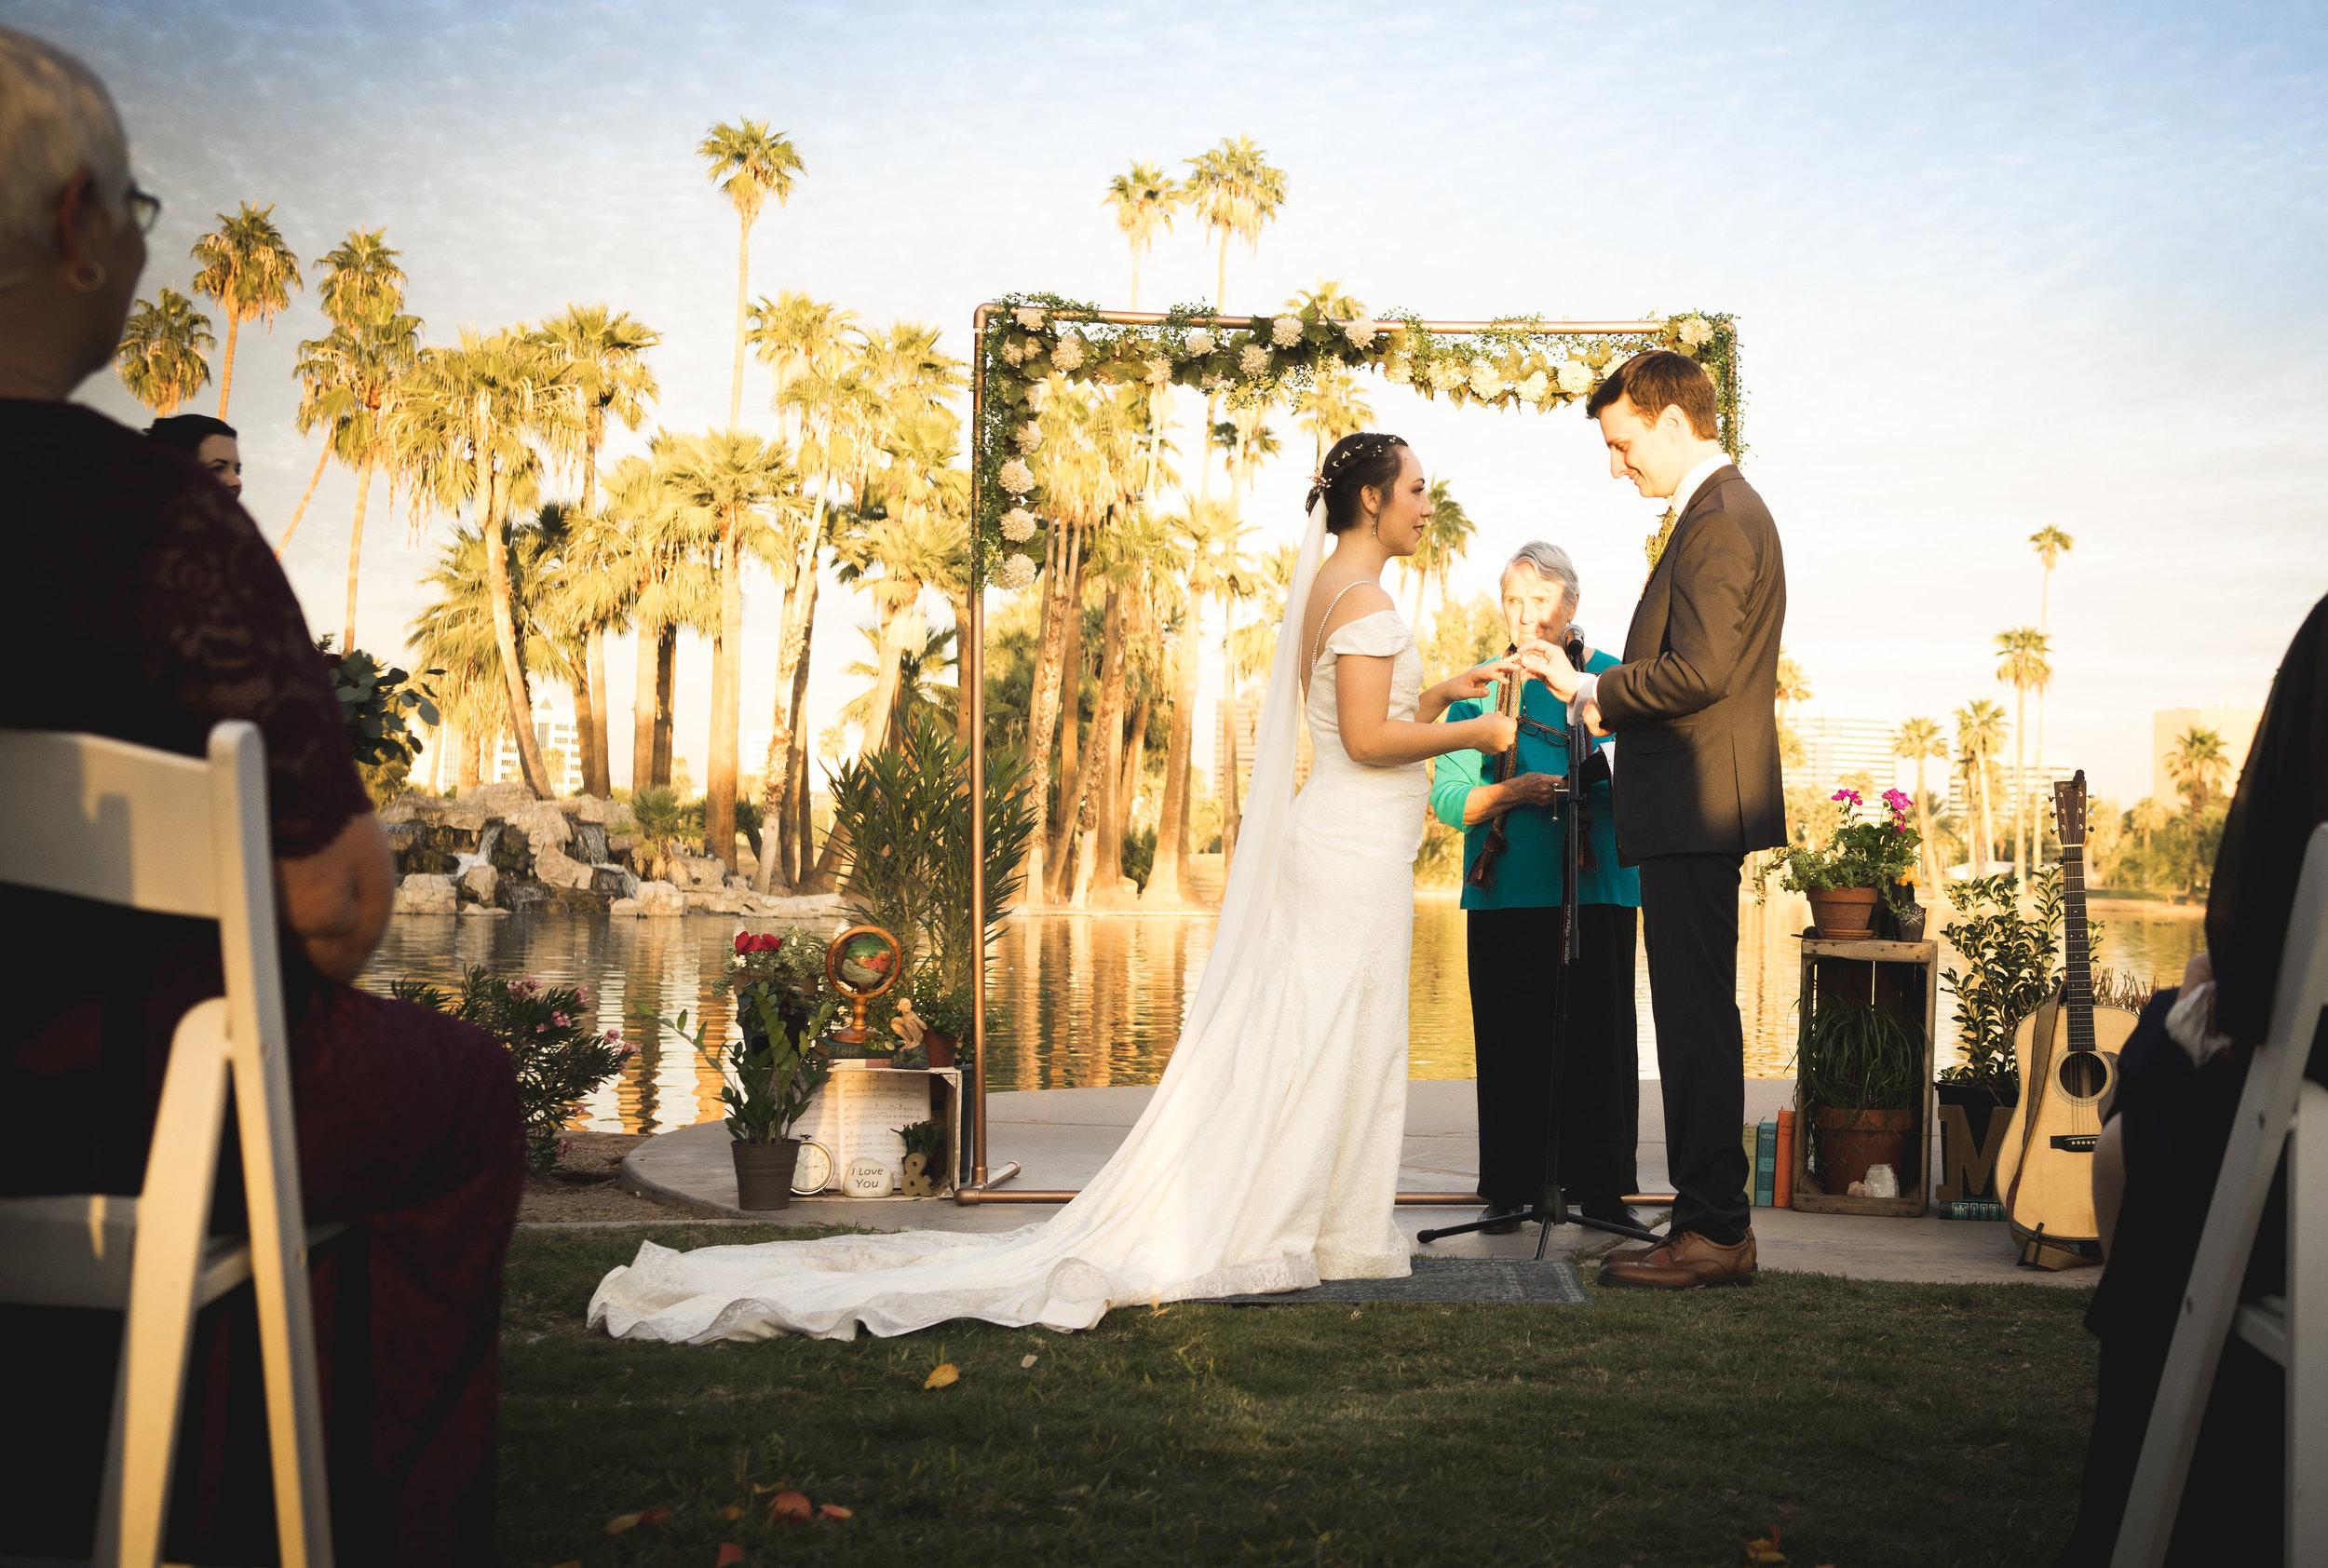 diy ceremony decor wedding encanto park arizona phoenix weddings scottsdale budget